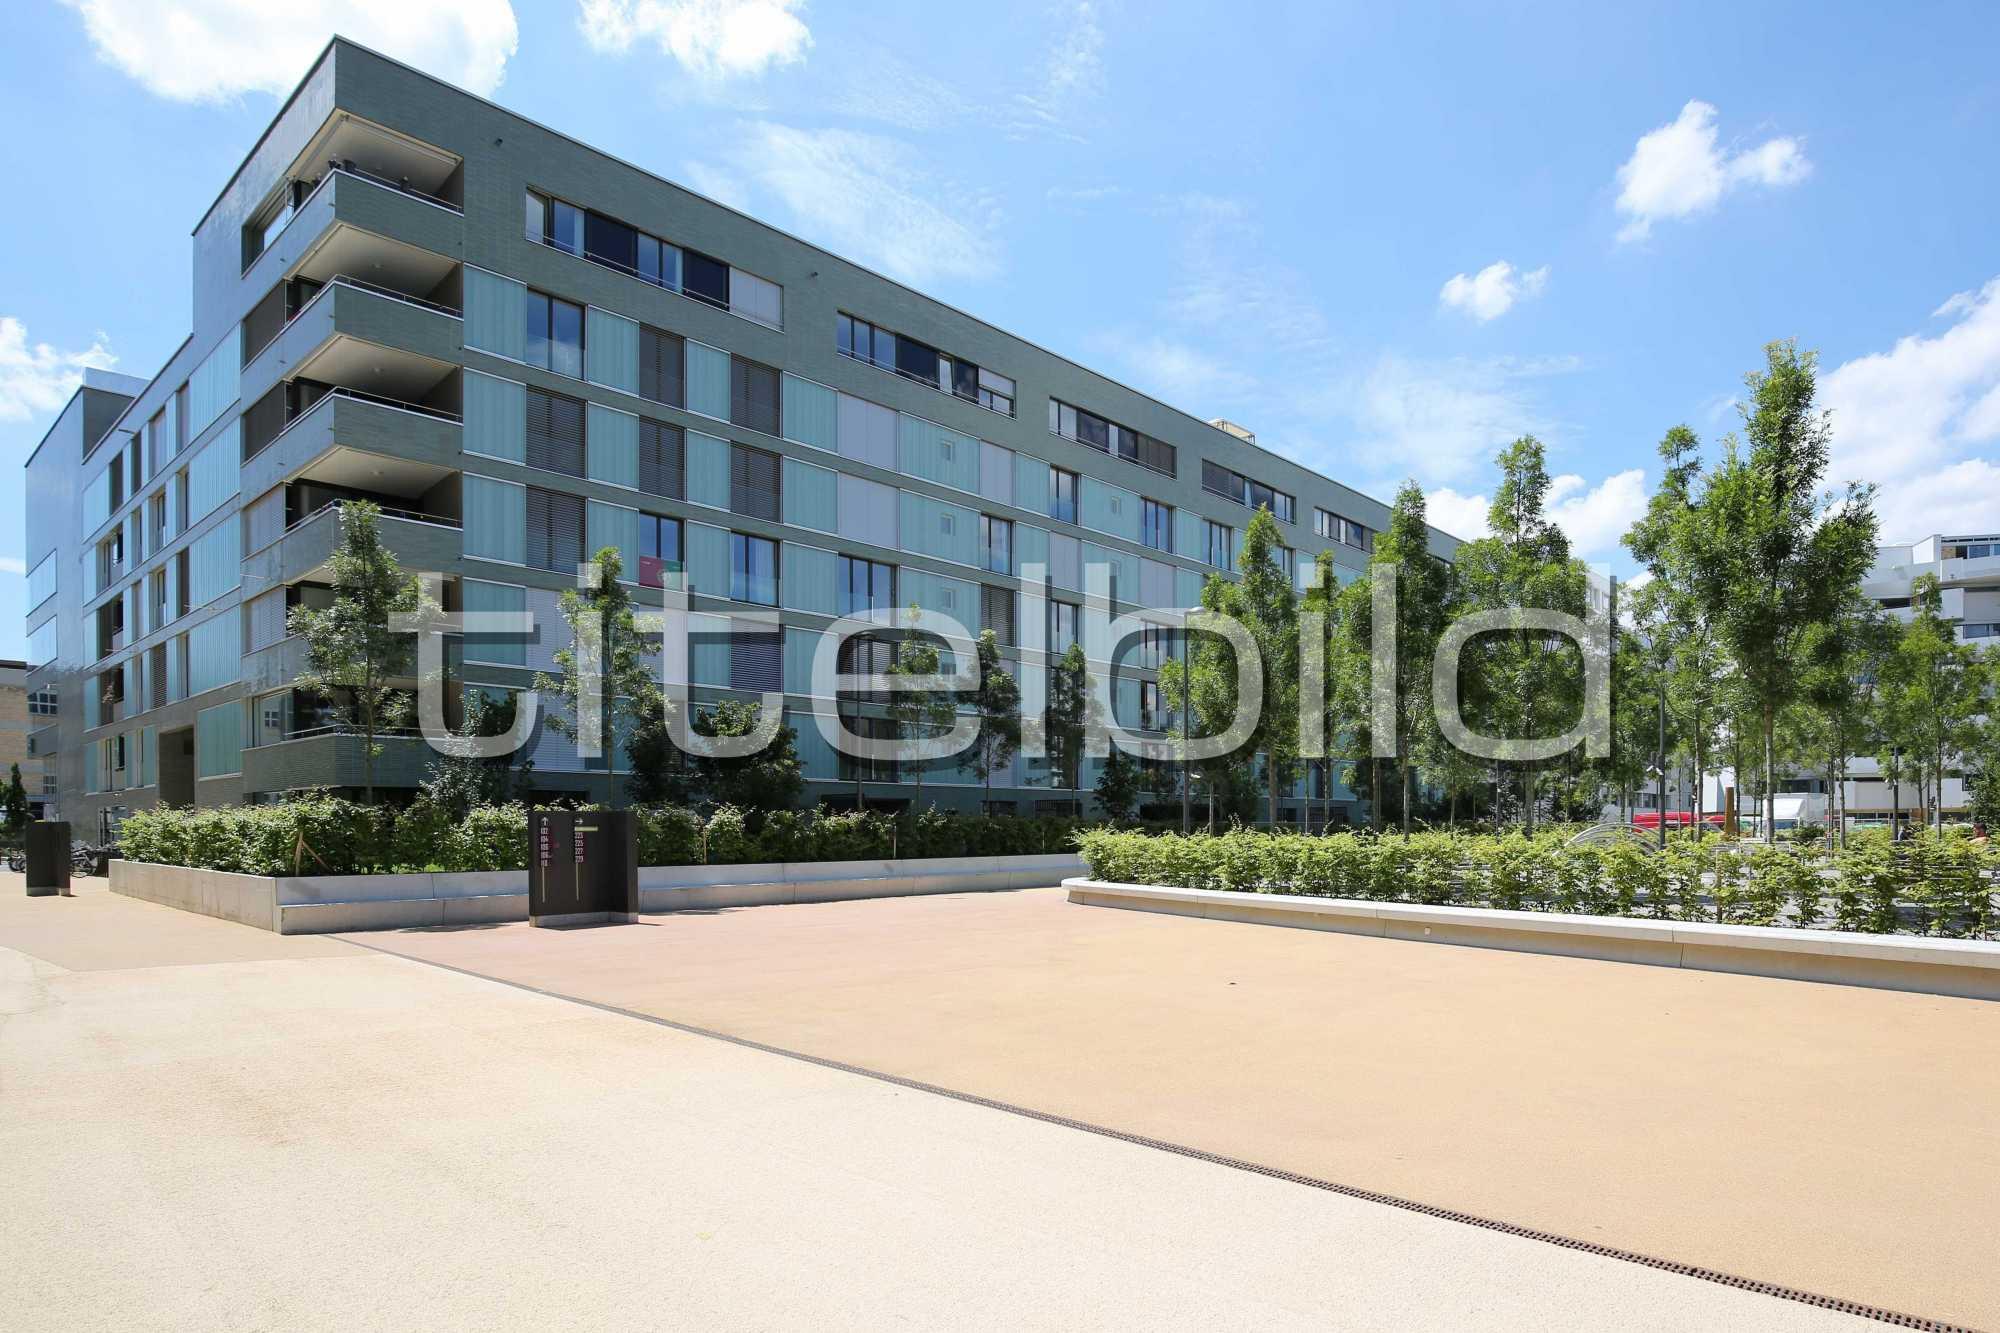 Projektbild-Nr. 3: HardturmPark Baufeld A2 Mietwohnungen